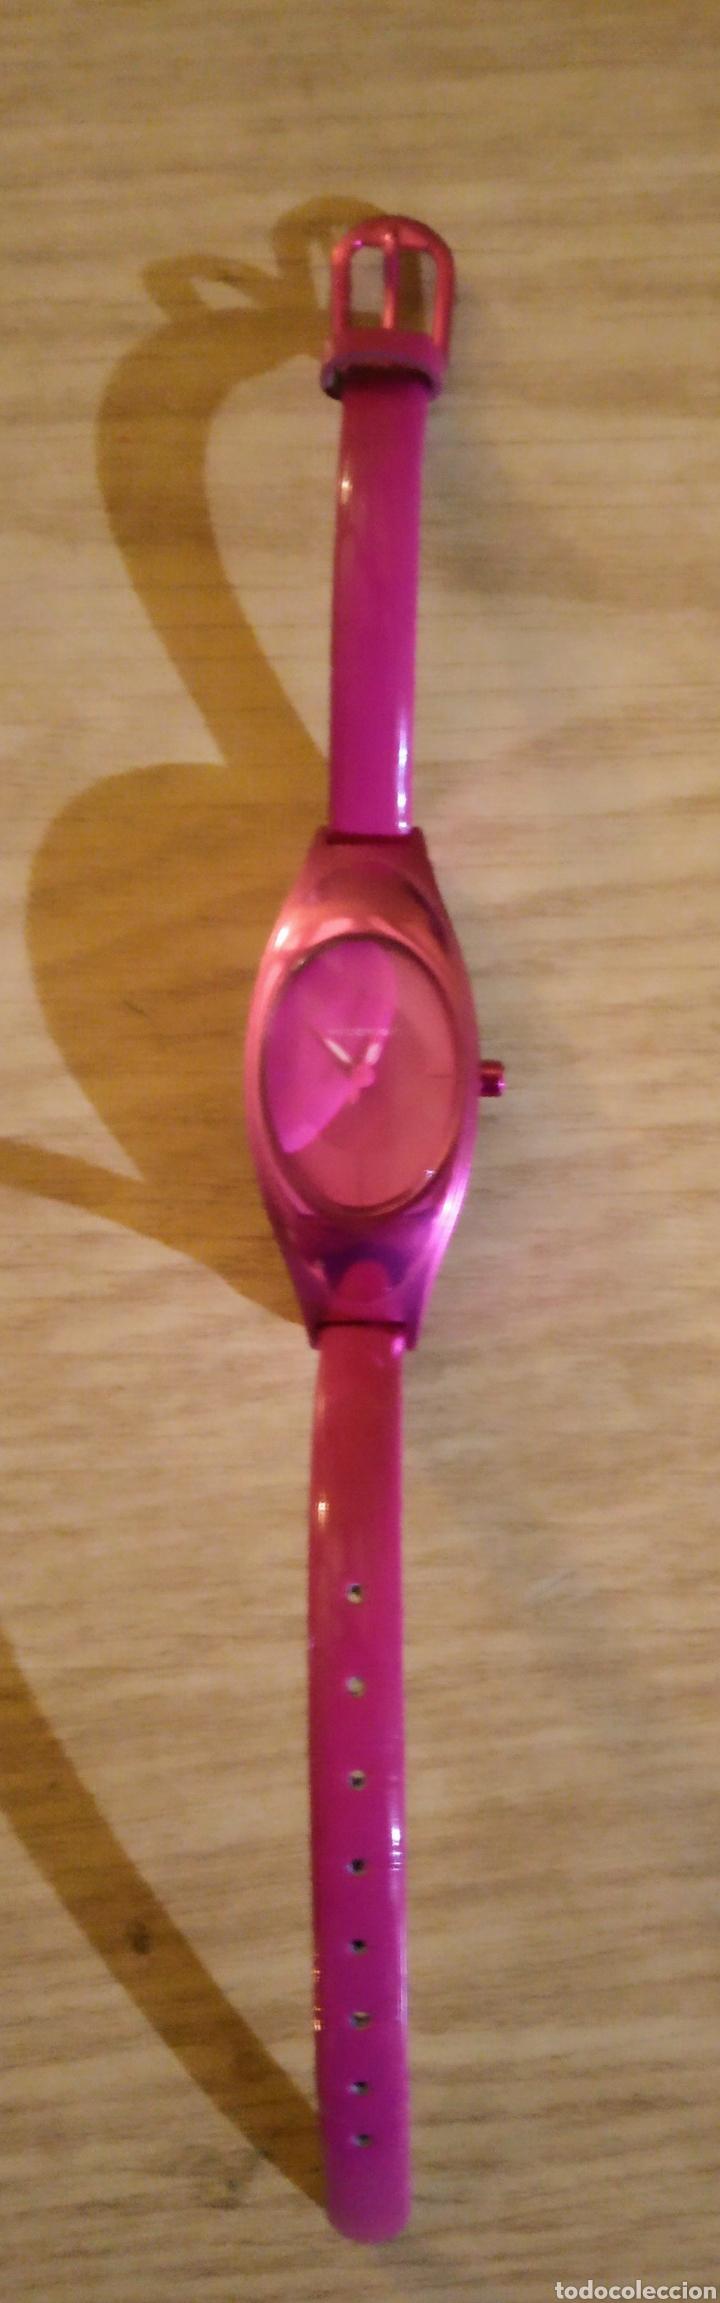 Relojes - Viceroy: RELOJ PARA MUJER VICEROY TIPO OVALADO R47702 NUEVO DE STOCK - Foto 3 - 241940140